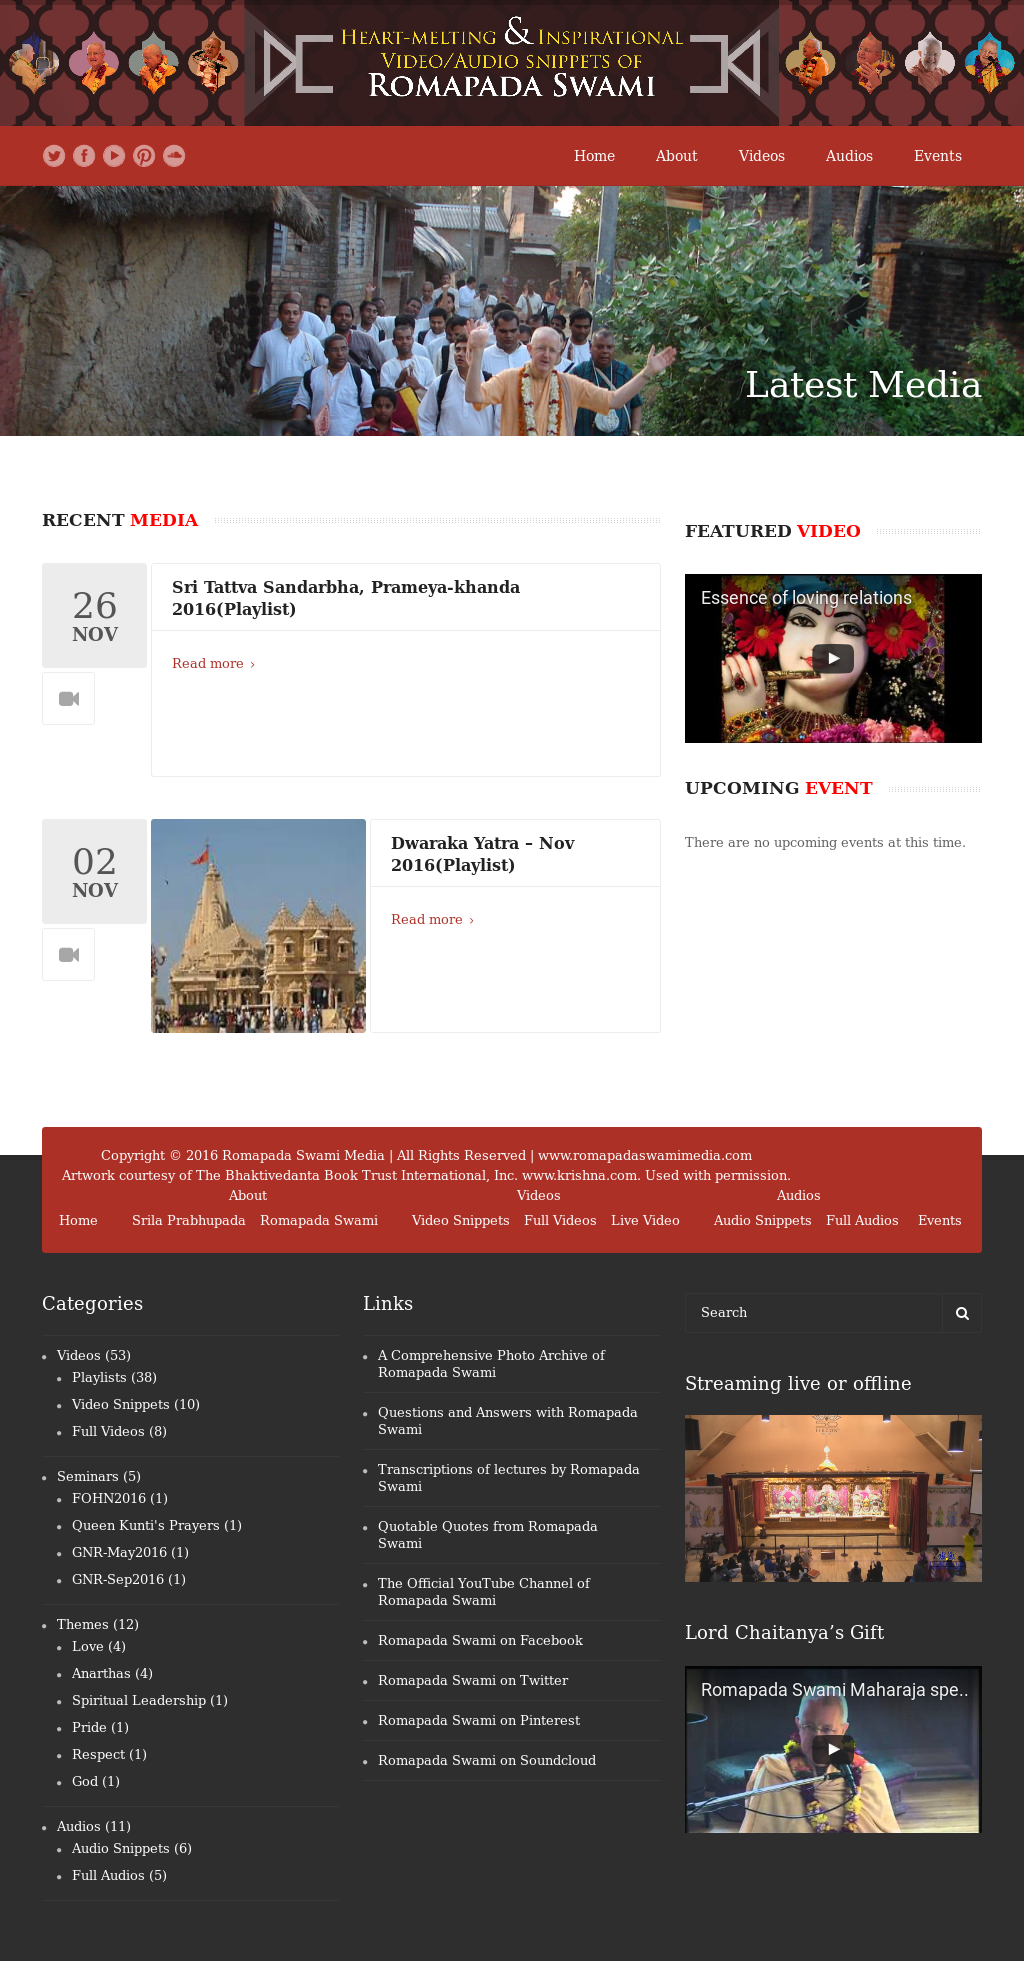 Romapada Swami Media Competitors, Revenue and Employees - Owler